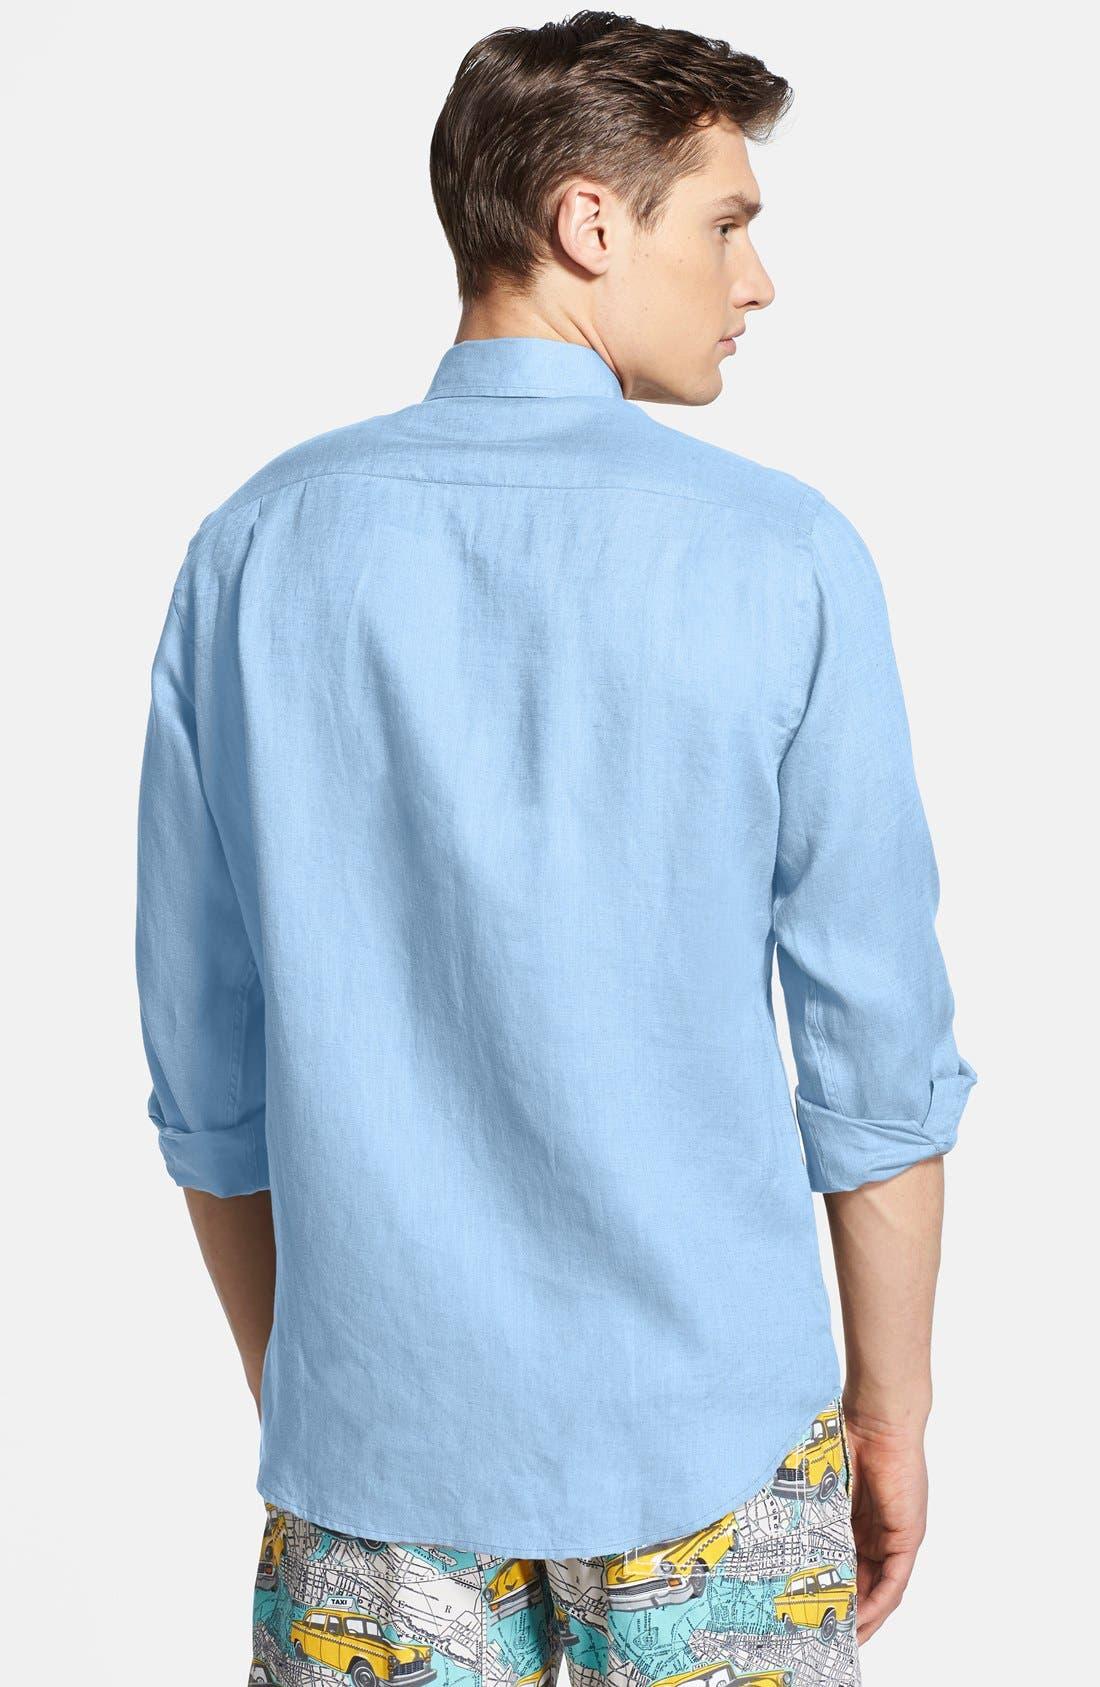 'Caroubier' Linen Shirt,                             Alternate thumbnail 2, color,                             450